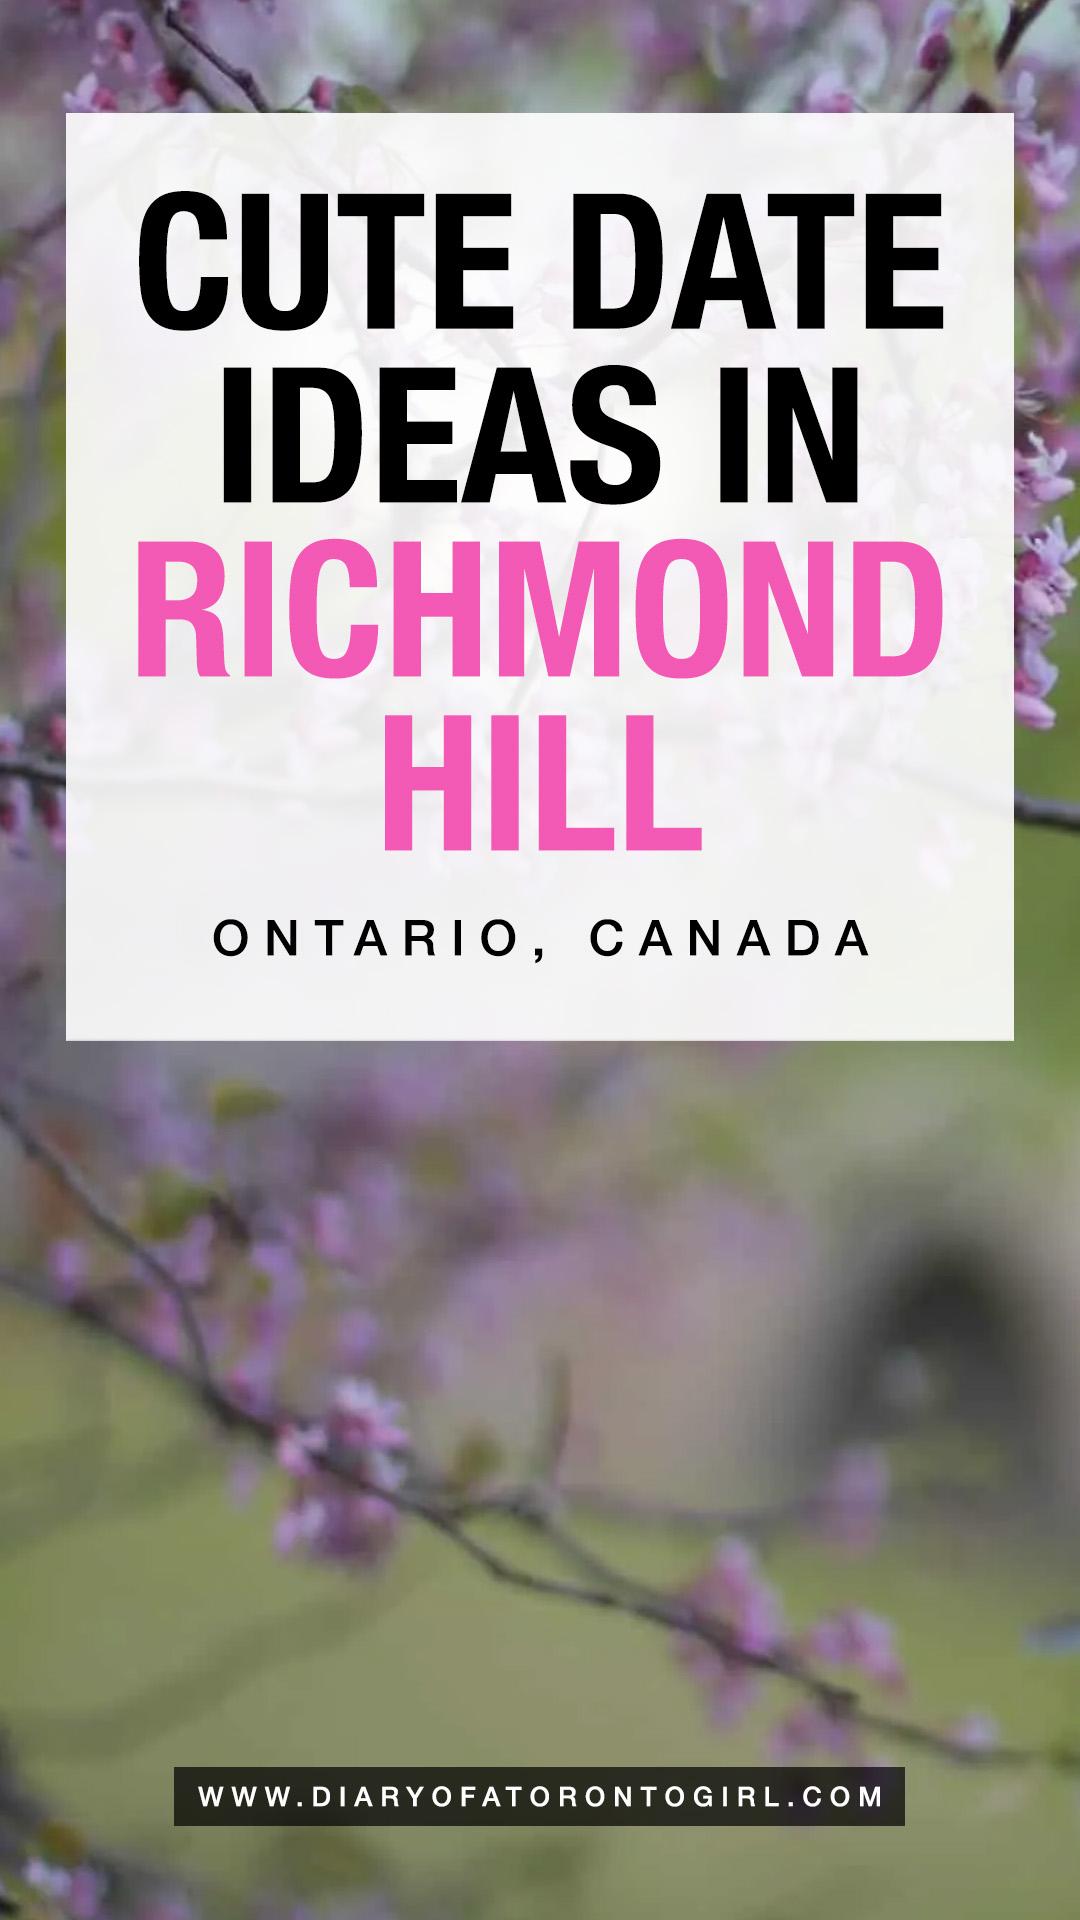 Date ideas in Richmond Hill